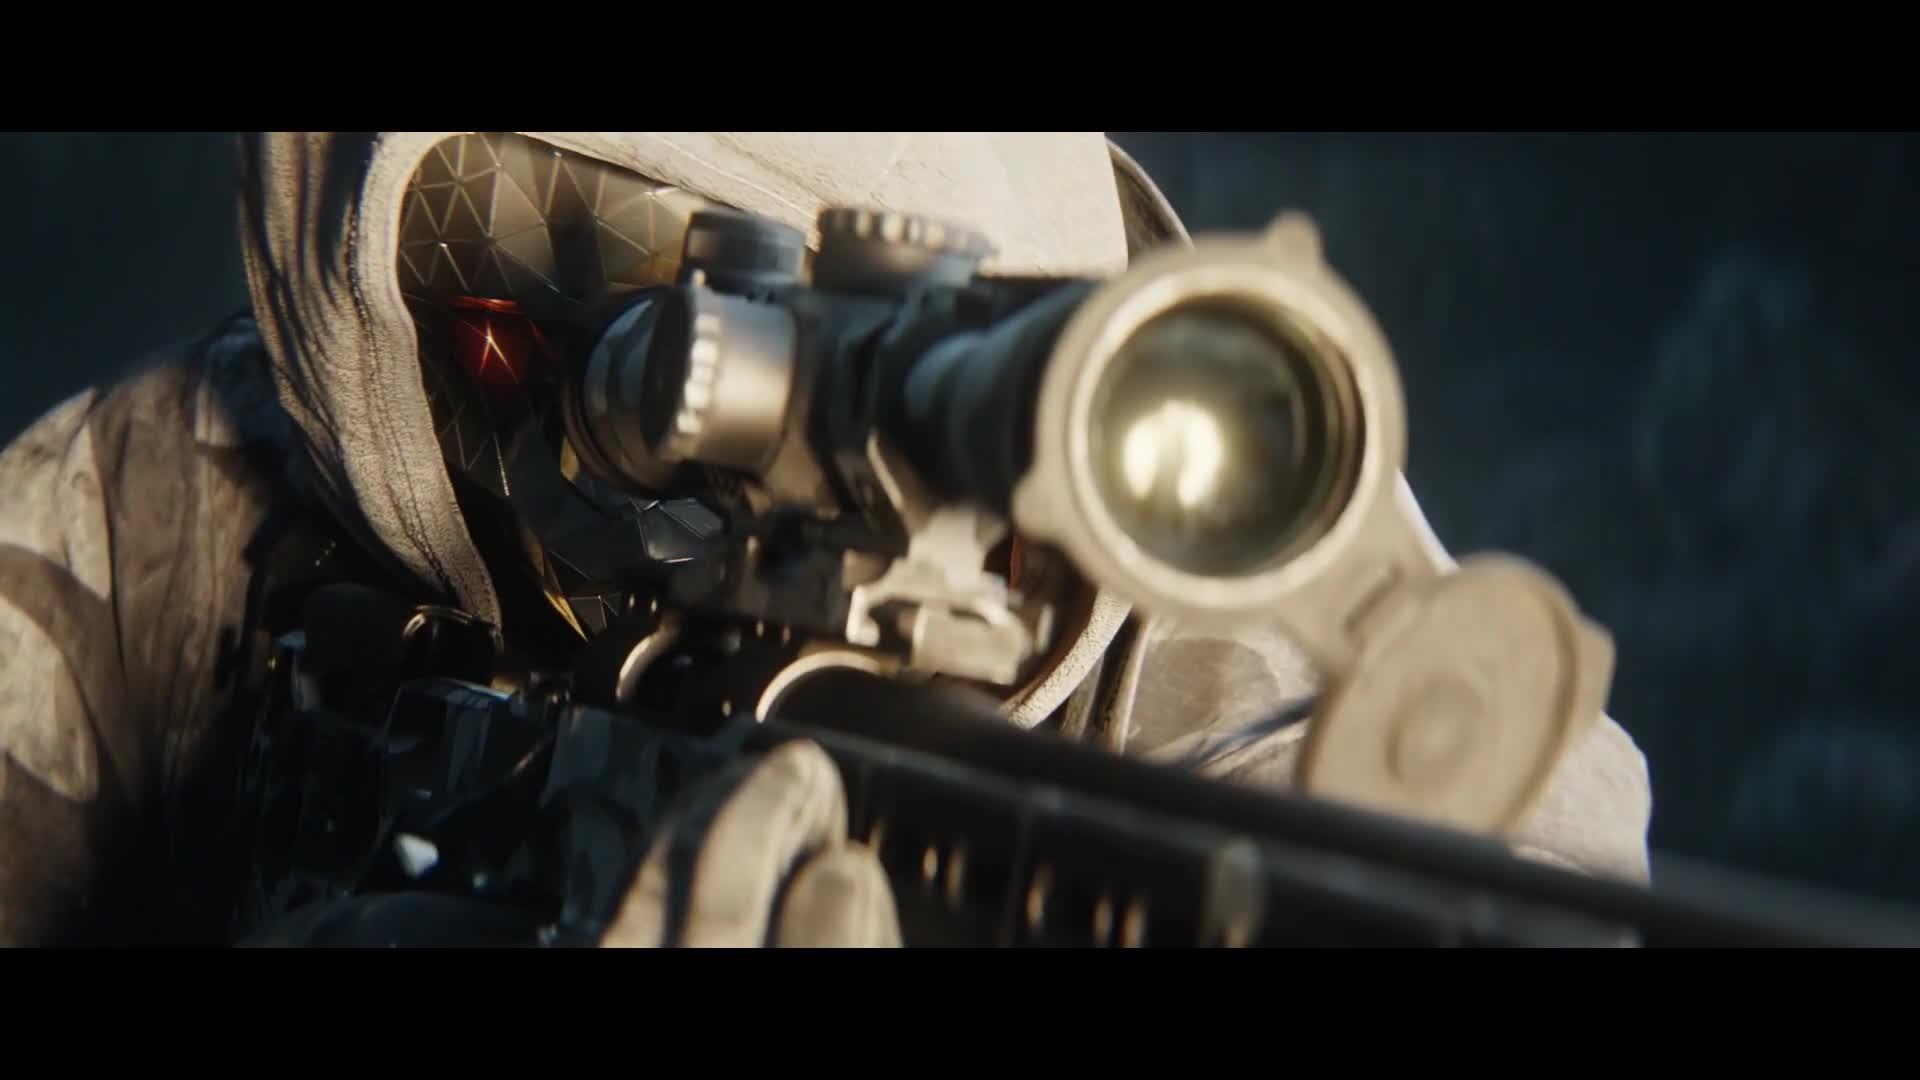 Trailer, Ego-Shooter, Shooter, Teaser, Ego Shooter, egoshooter, CI Games, Sniper Ghost Warrior Contracts, Sniper Ghost Warrior